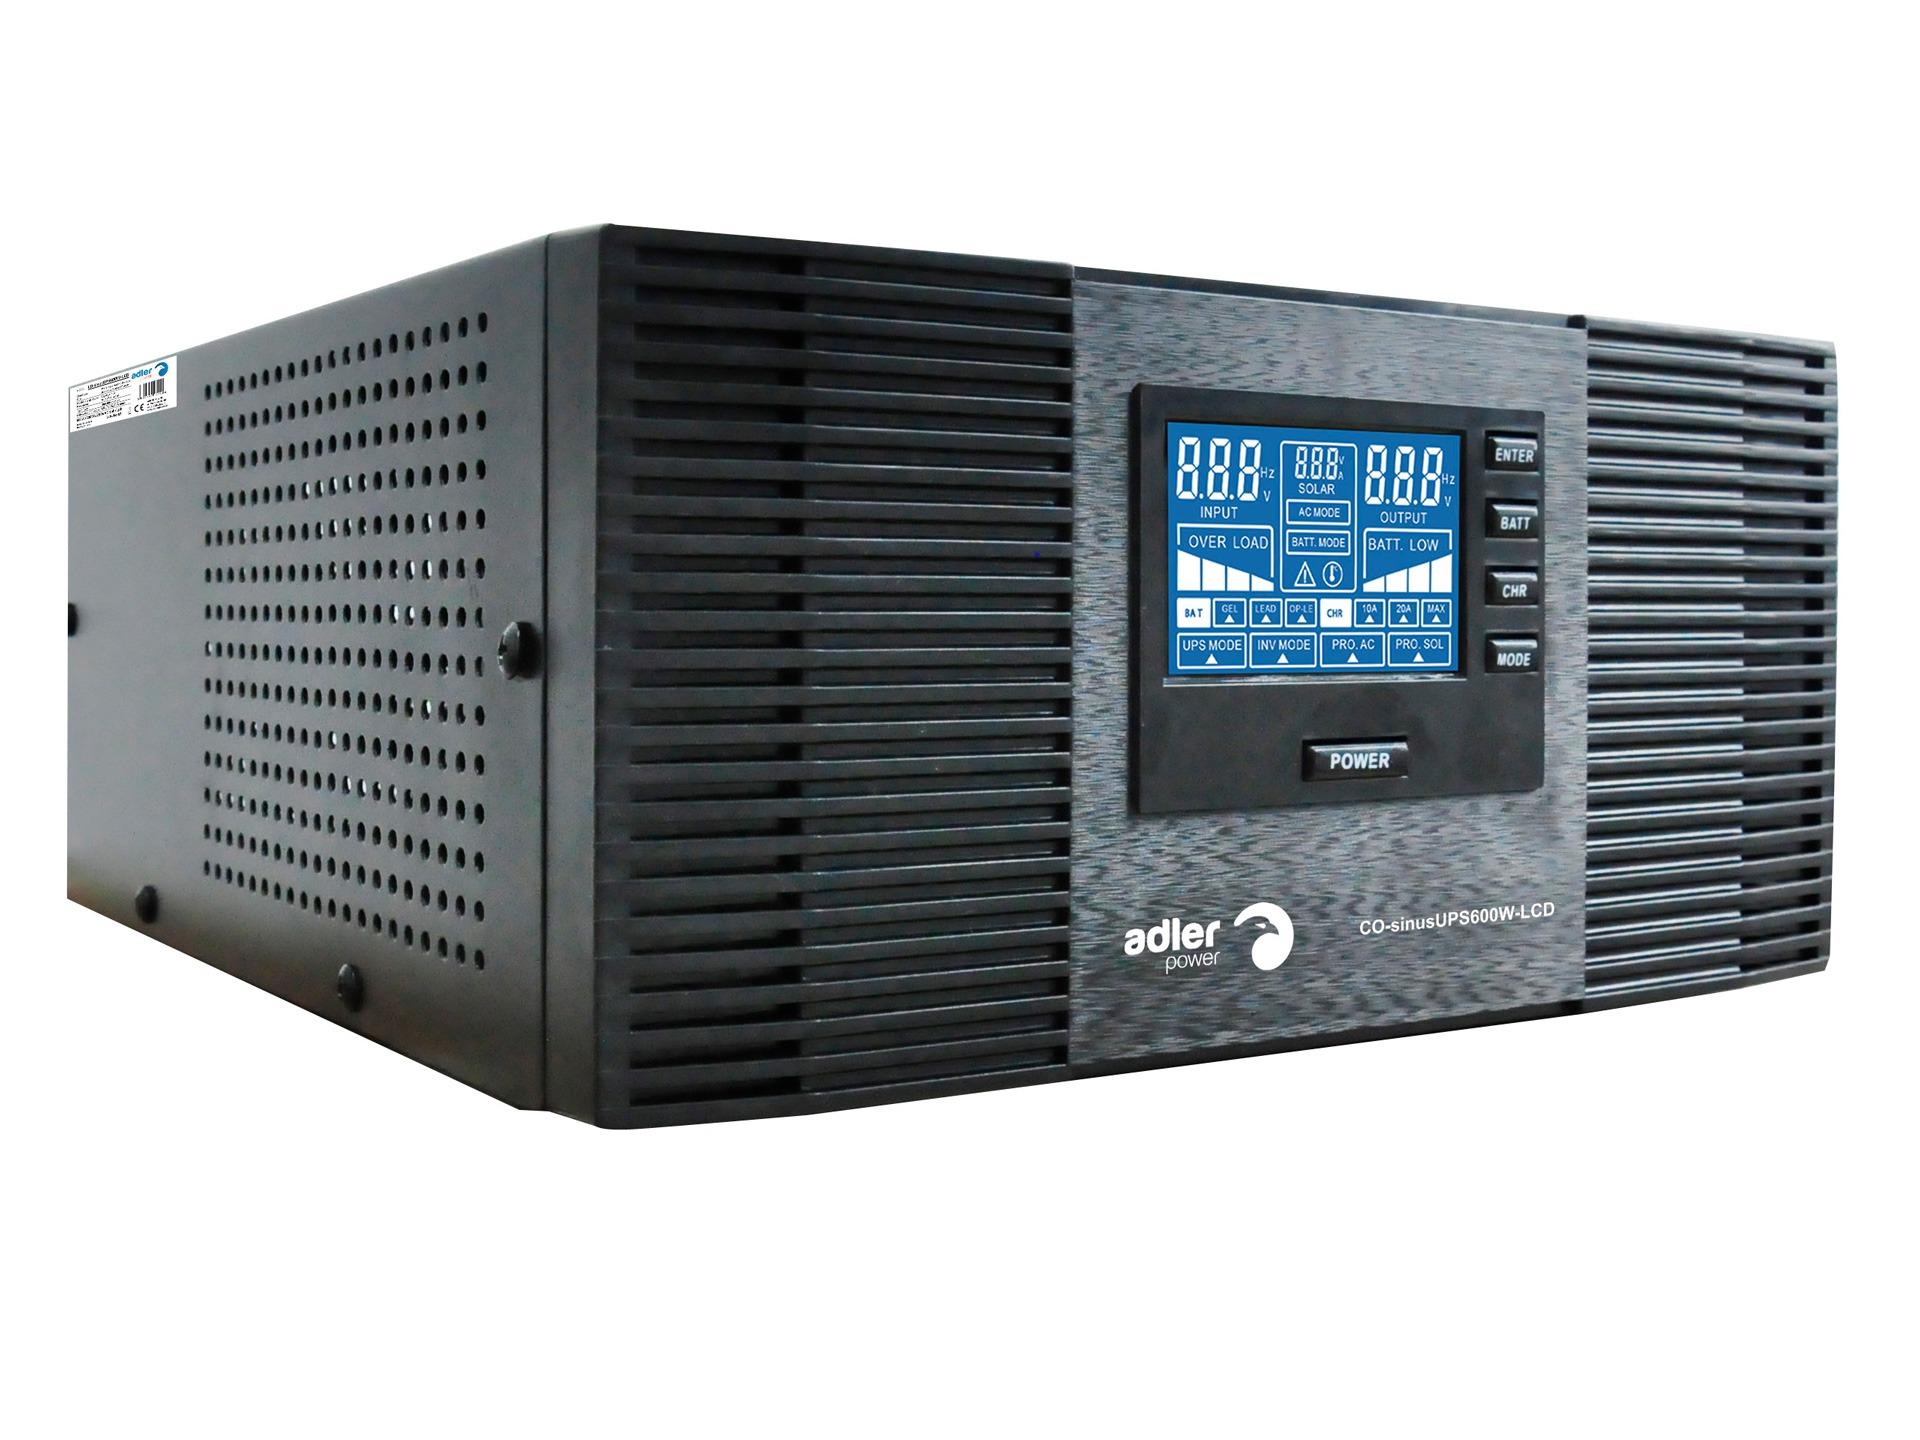 CO-sinusUPS-600W-LCD